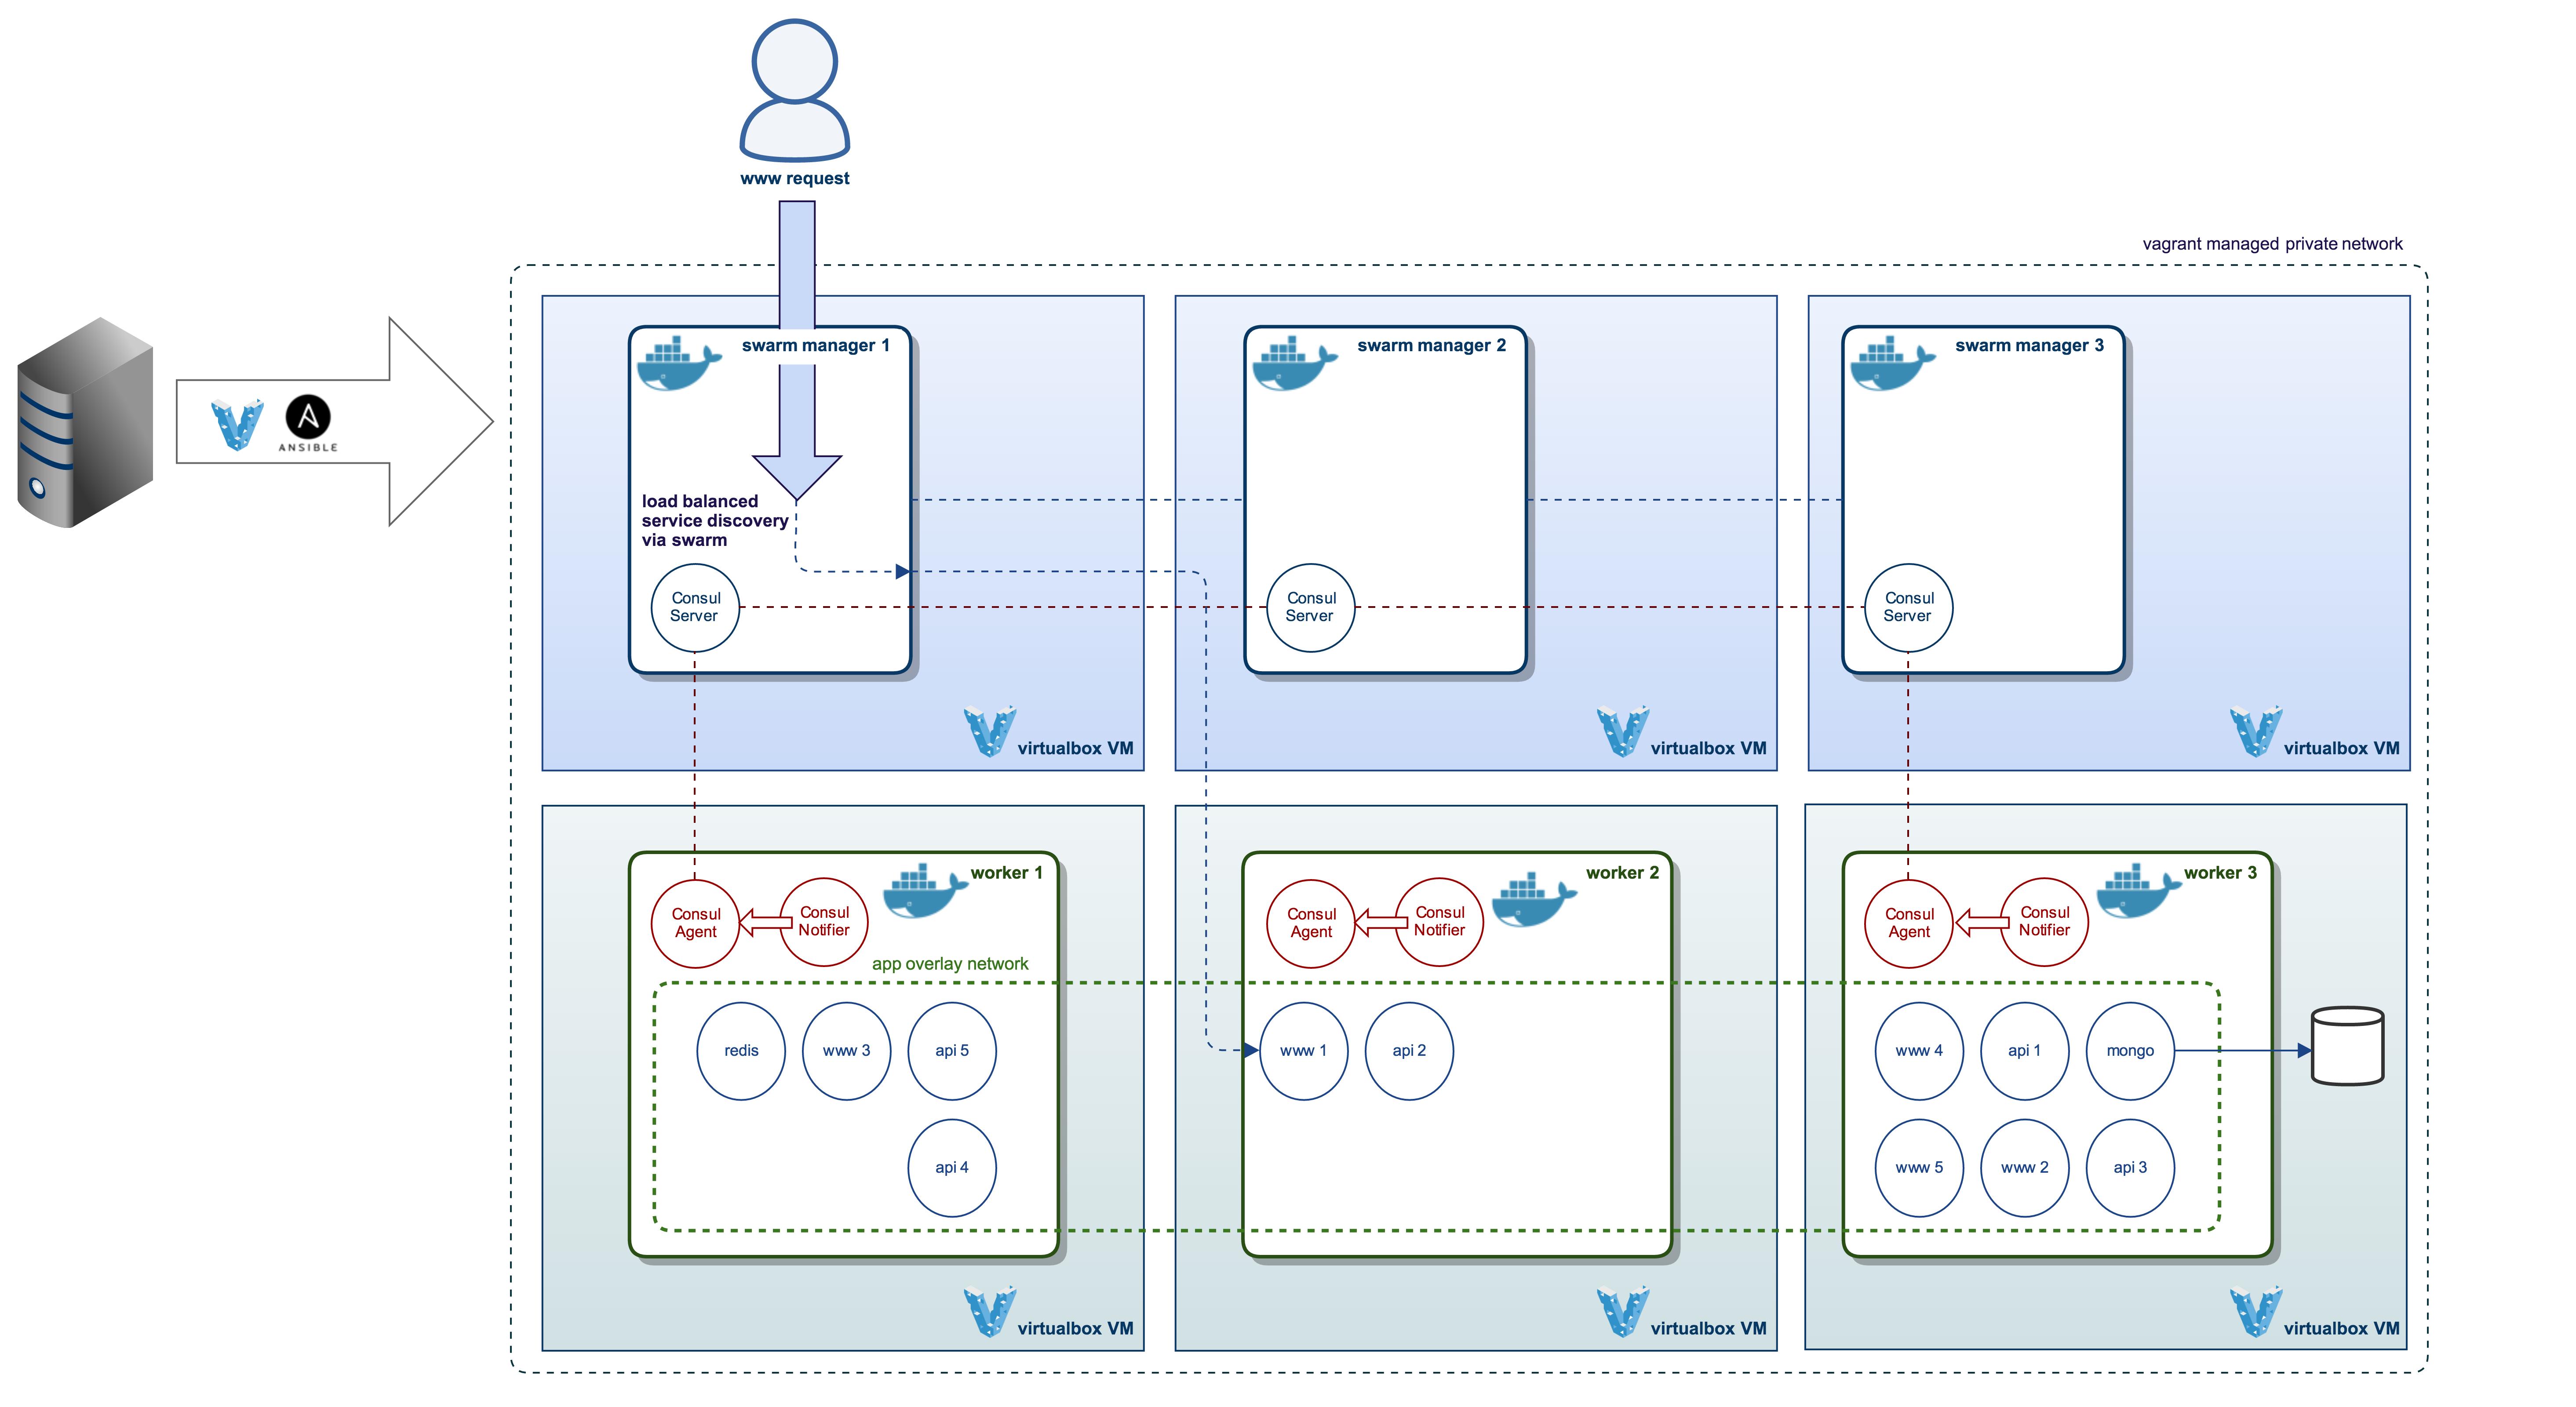 GitHub - jamesdmorgan/vagrant-ansible-docker-swarm: Docker 1 12